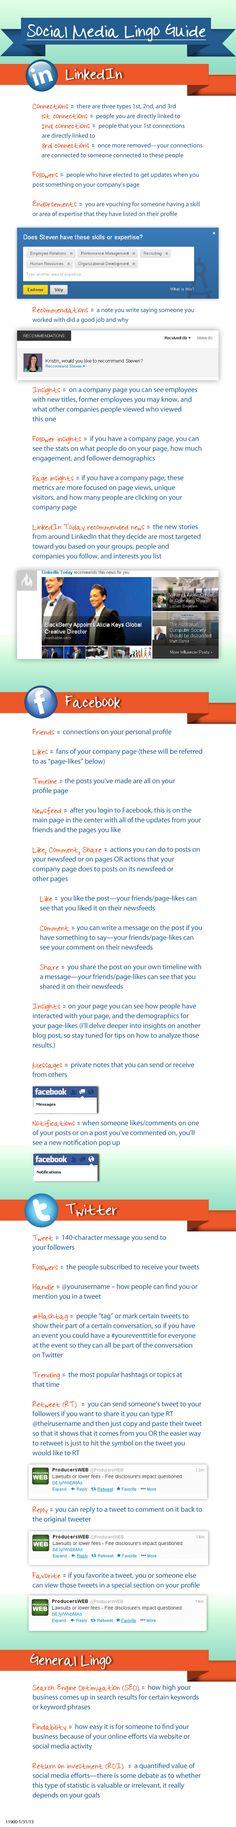 Social Media Lingo Guide #socialmedia #twitter #facebook